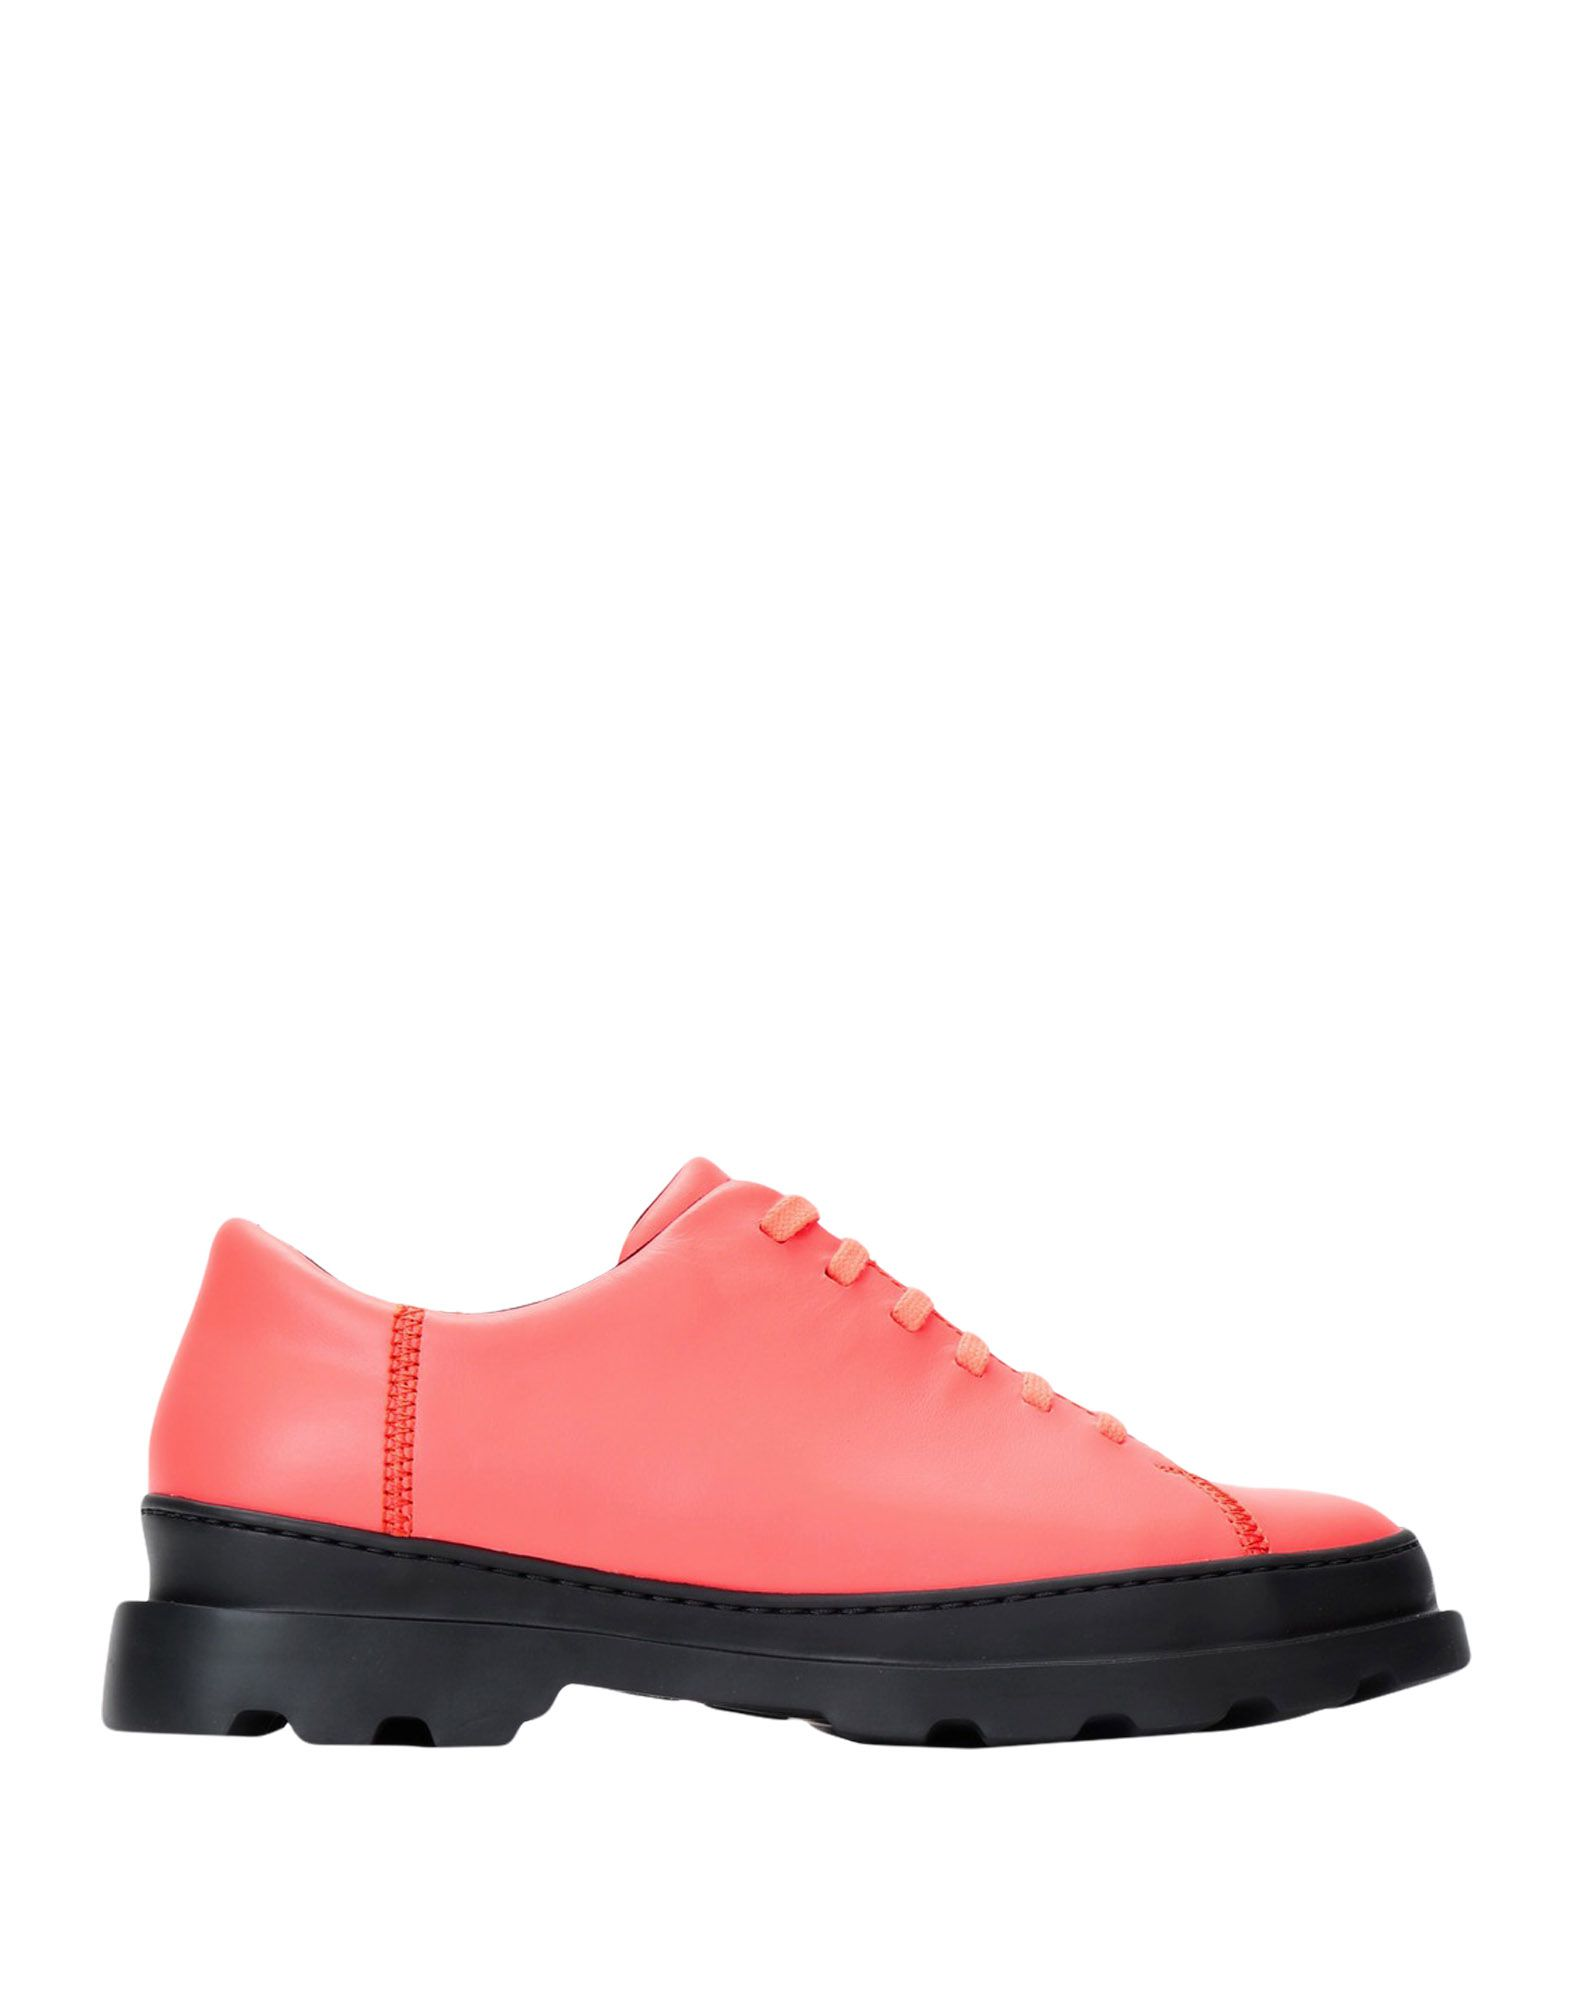 Camper Sneakers - Women Camper Sneakers Kingdom online on  United Kingdom Sneakers - 11555877PJ 55e8f2